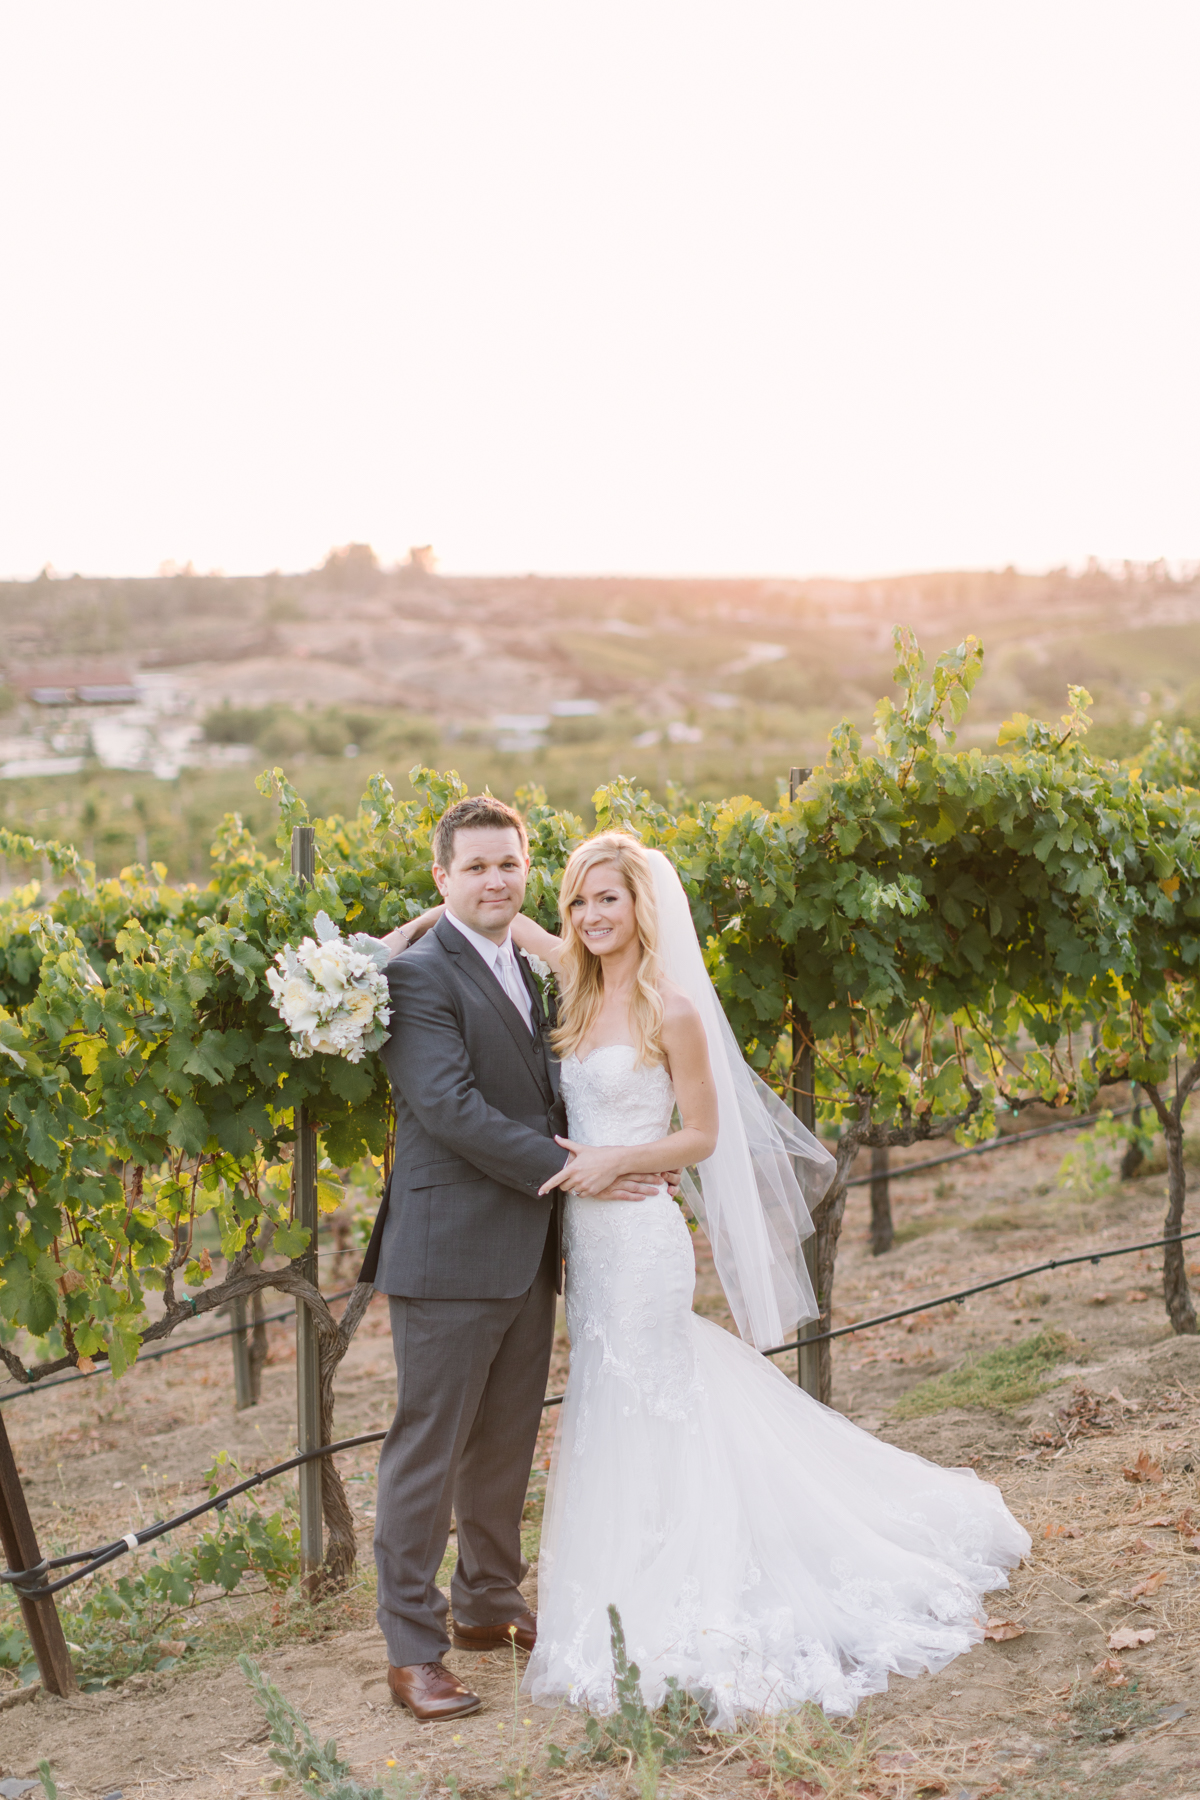 Orange-County-Wedding-Photography-Brianna-Caster-and-Co-Photographers-Falkner-Winery-Wedding-5